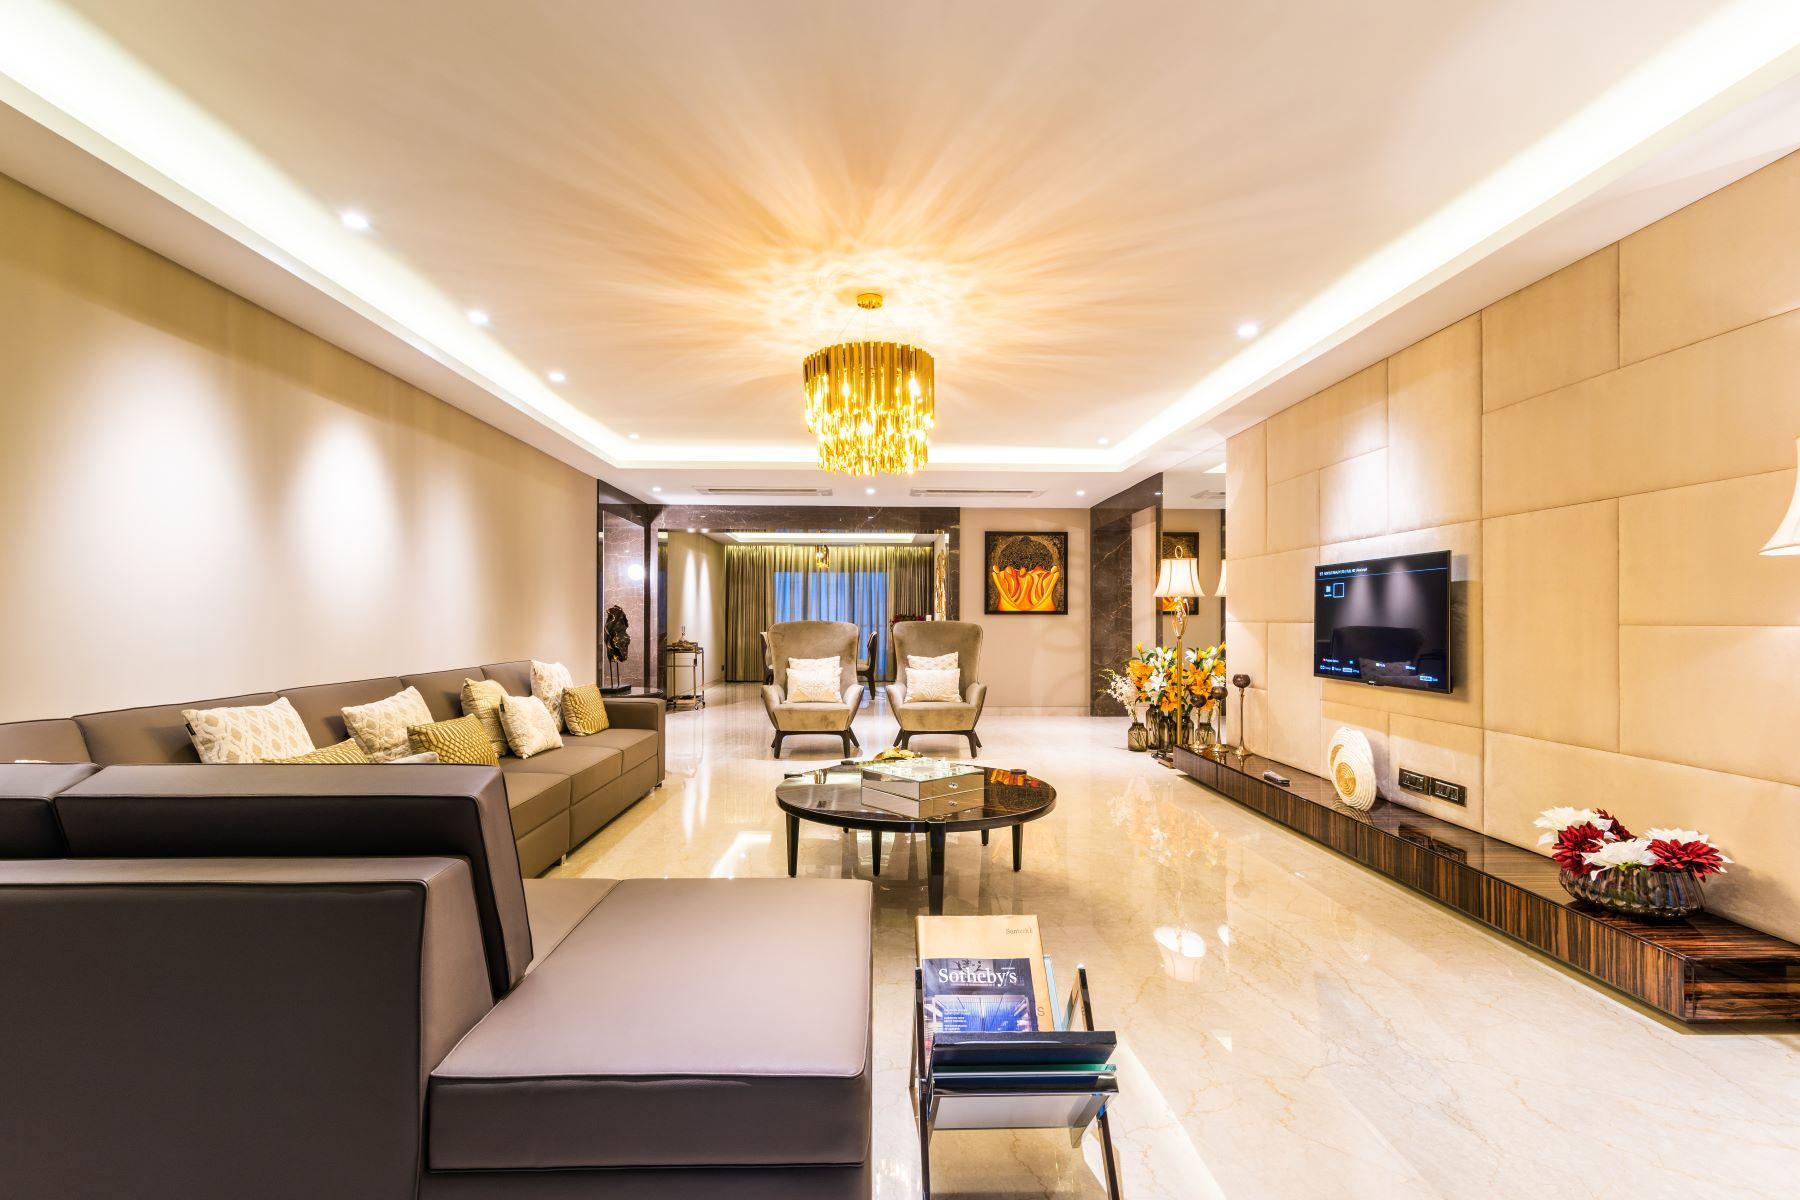 Apartments 为 出租 在 Signia Pearl (Venetian suite) Signia Pearl, Bandra Kurla Complex 孟买, 马哈拉托特拉邦 400051 印度